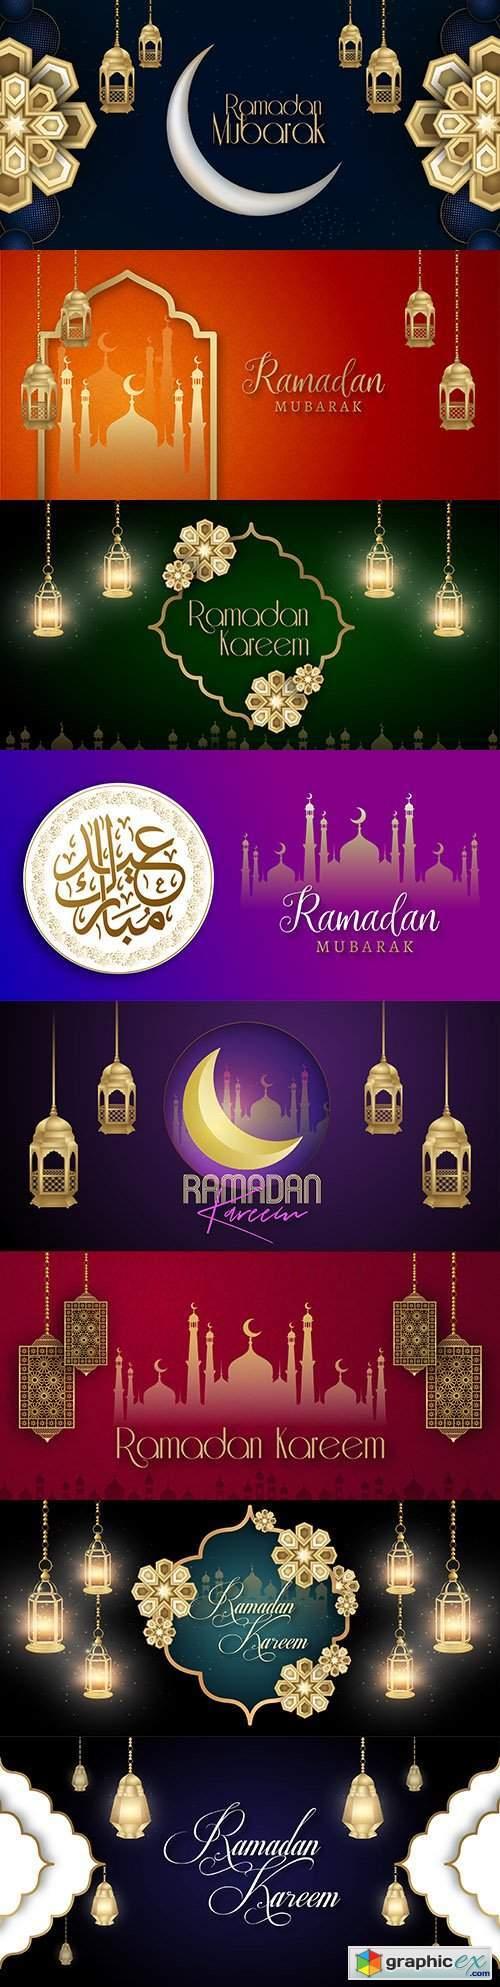 Ramadan Kareem Islamic social media banner design background